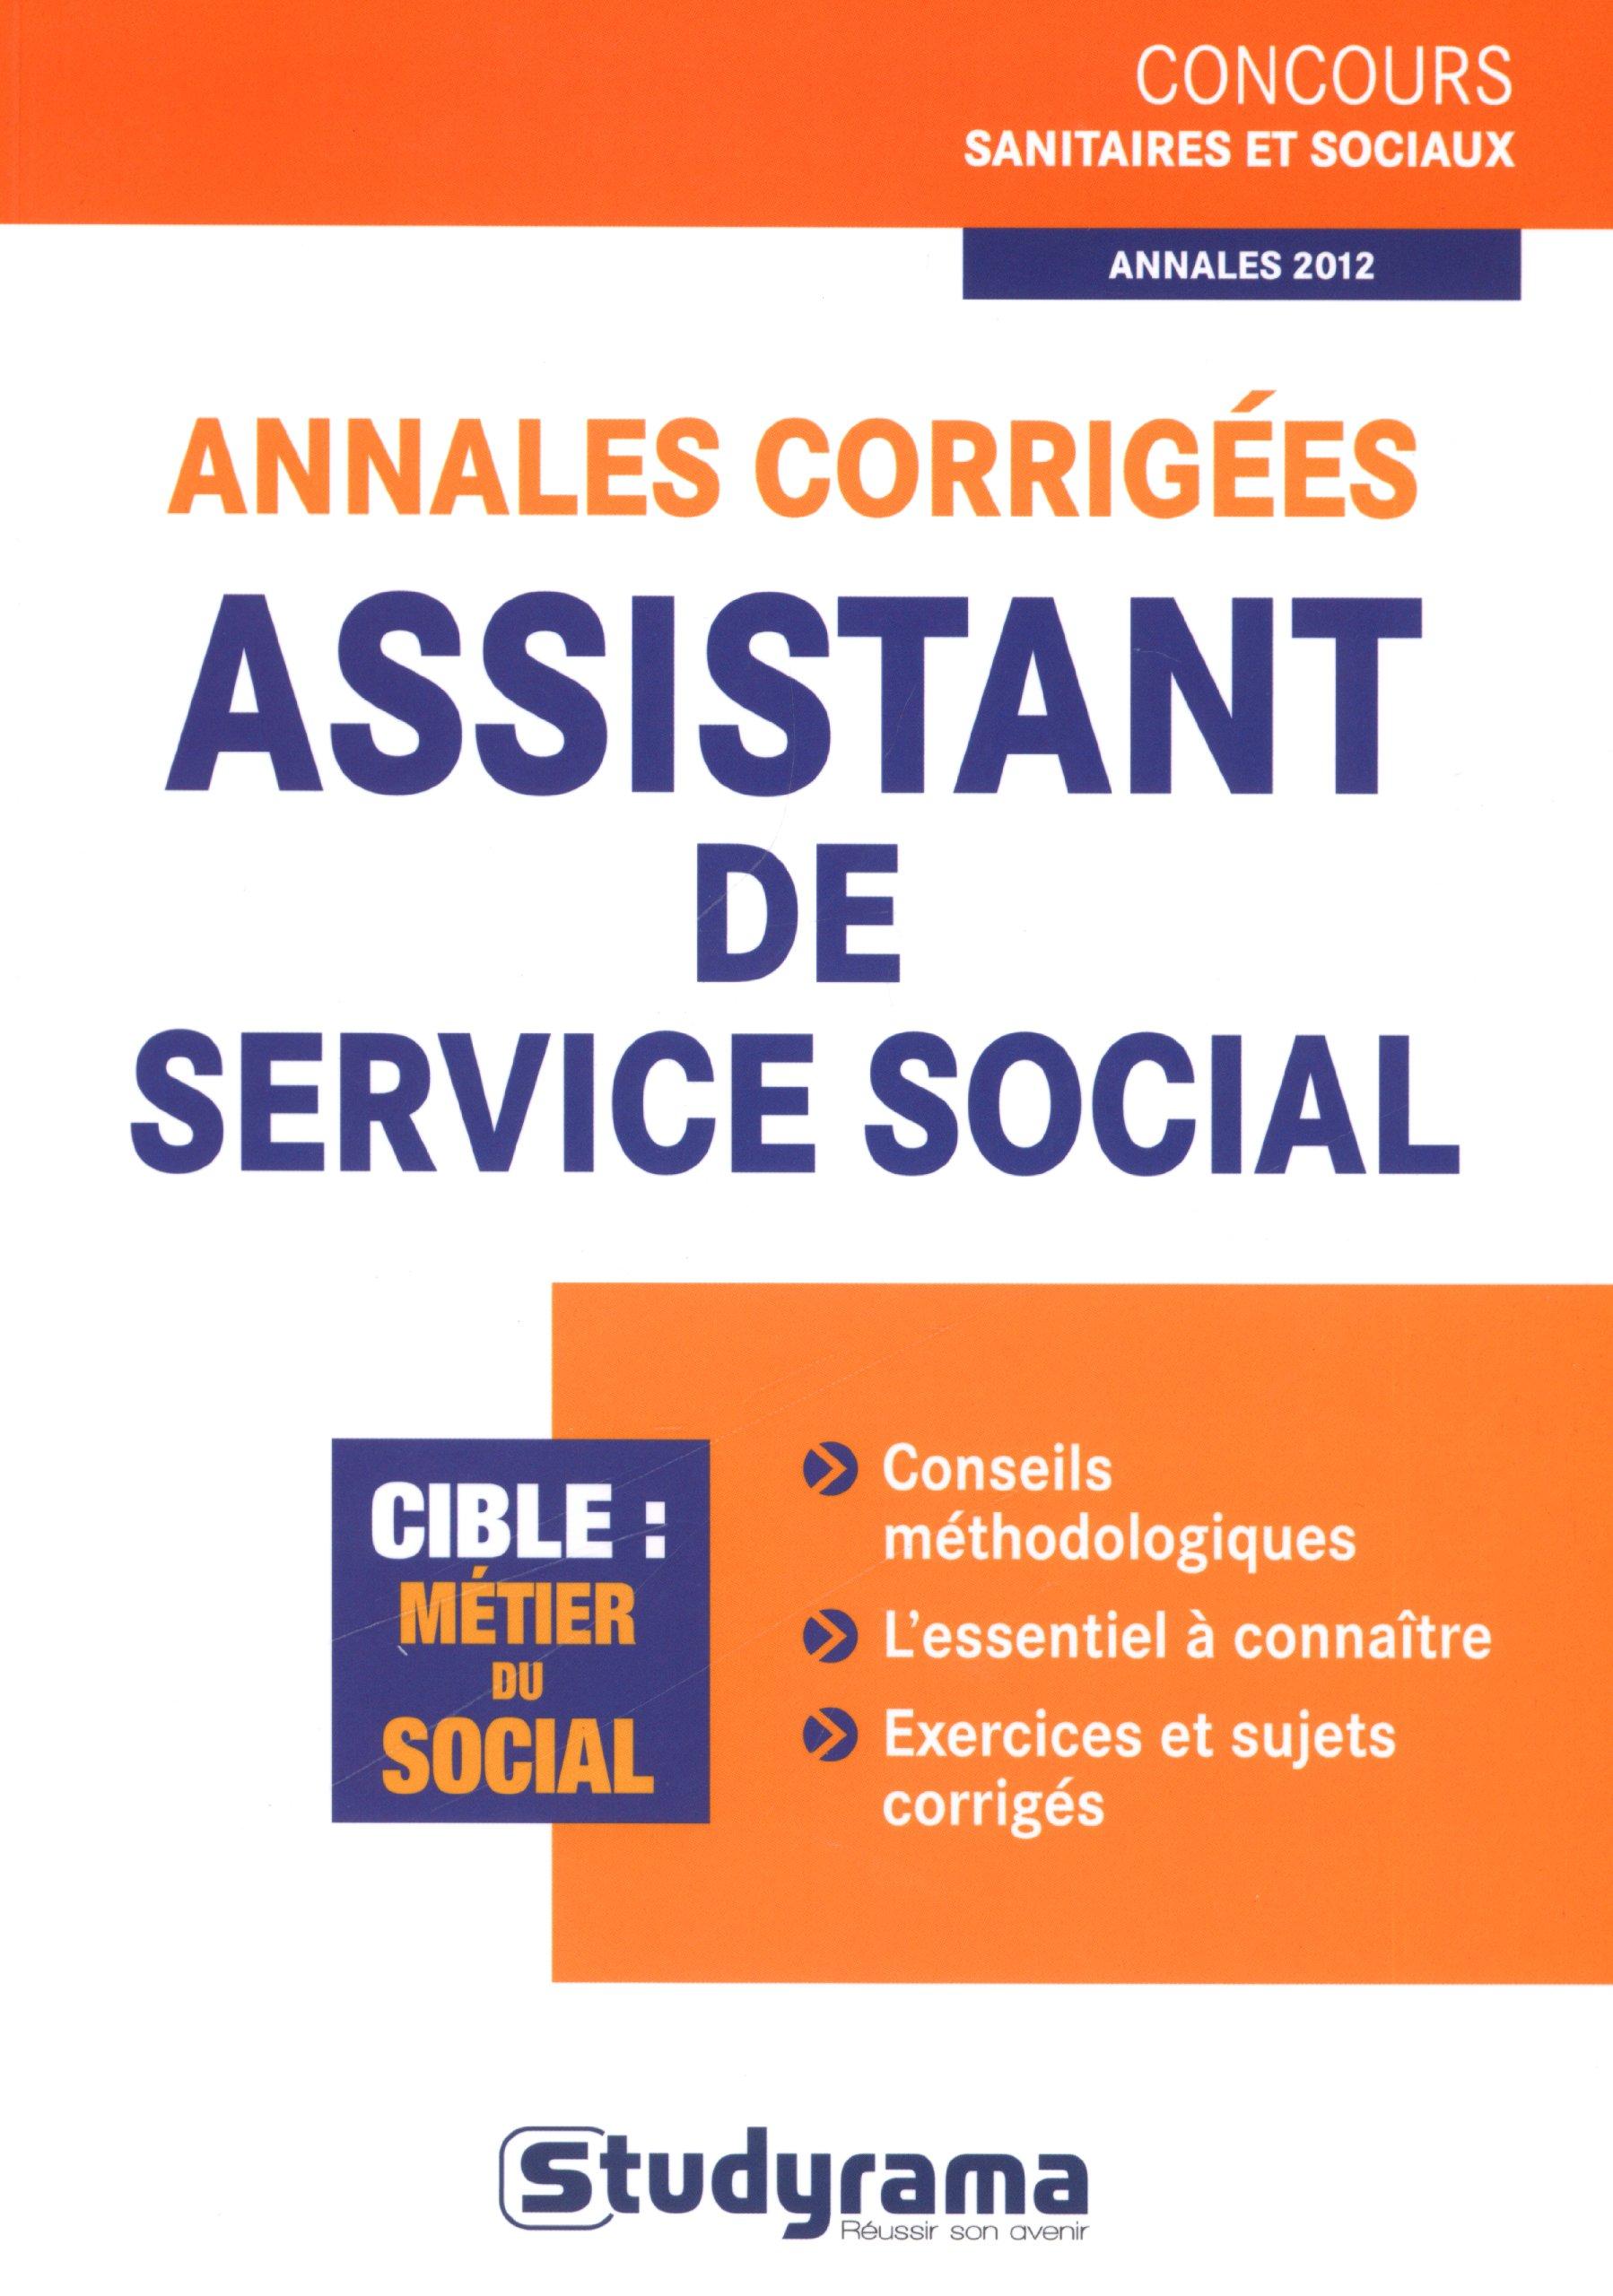 Annales corrigées assistant de service social Concours sanitaires et sociaux: Amazon.es: Orsetta Bechelloni: Libros en idiomas extranjeros